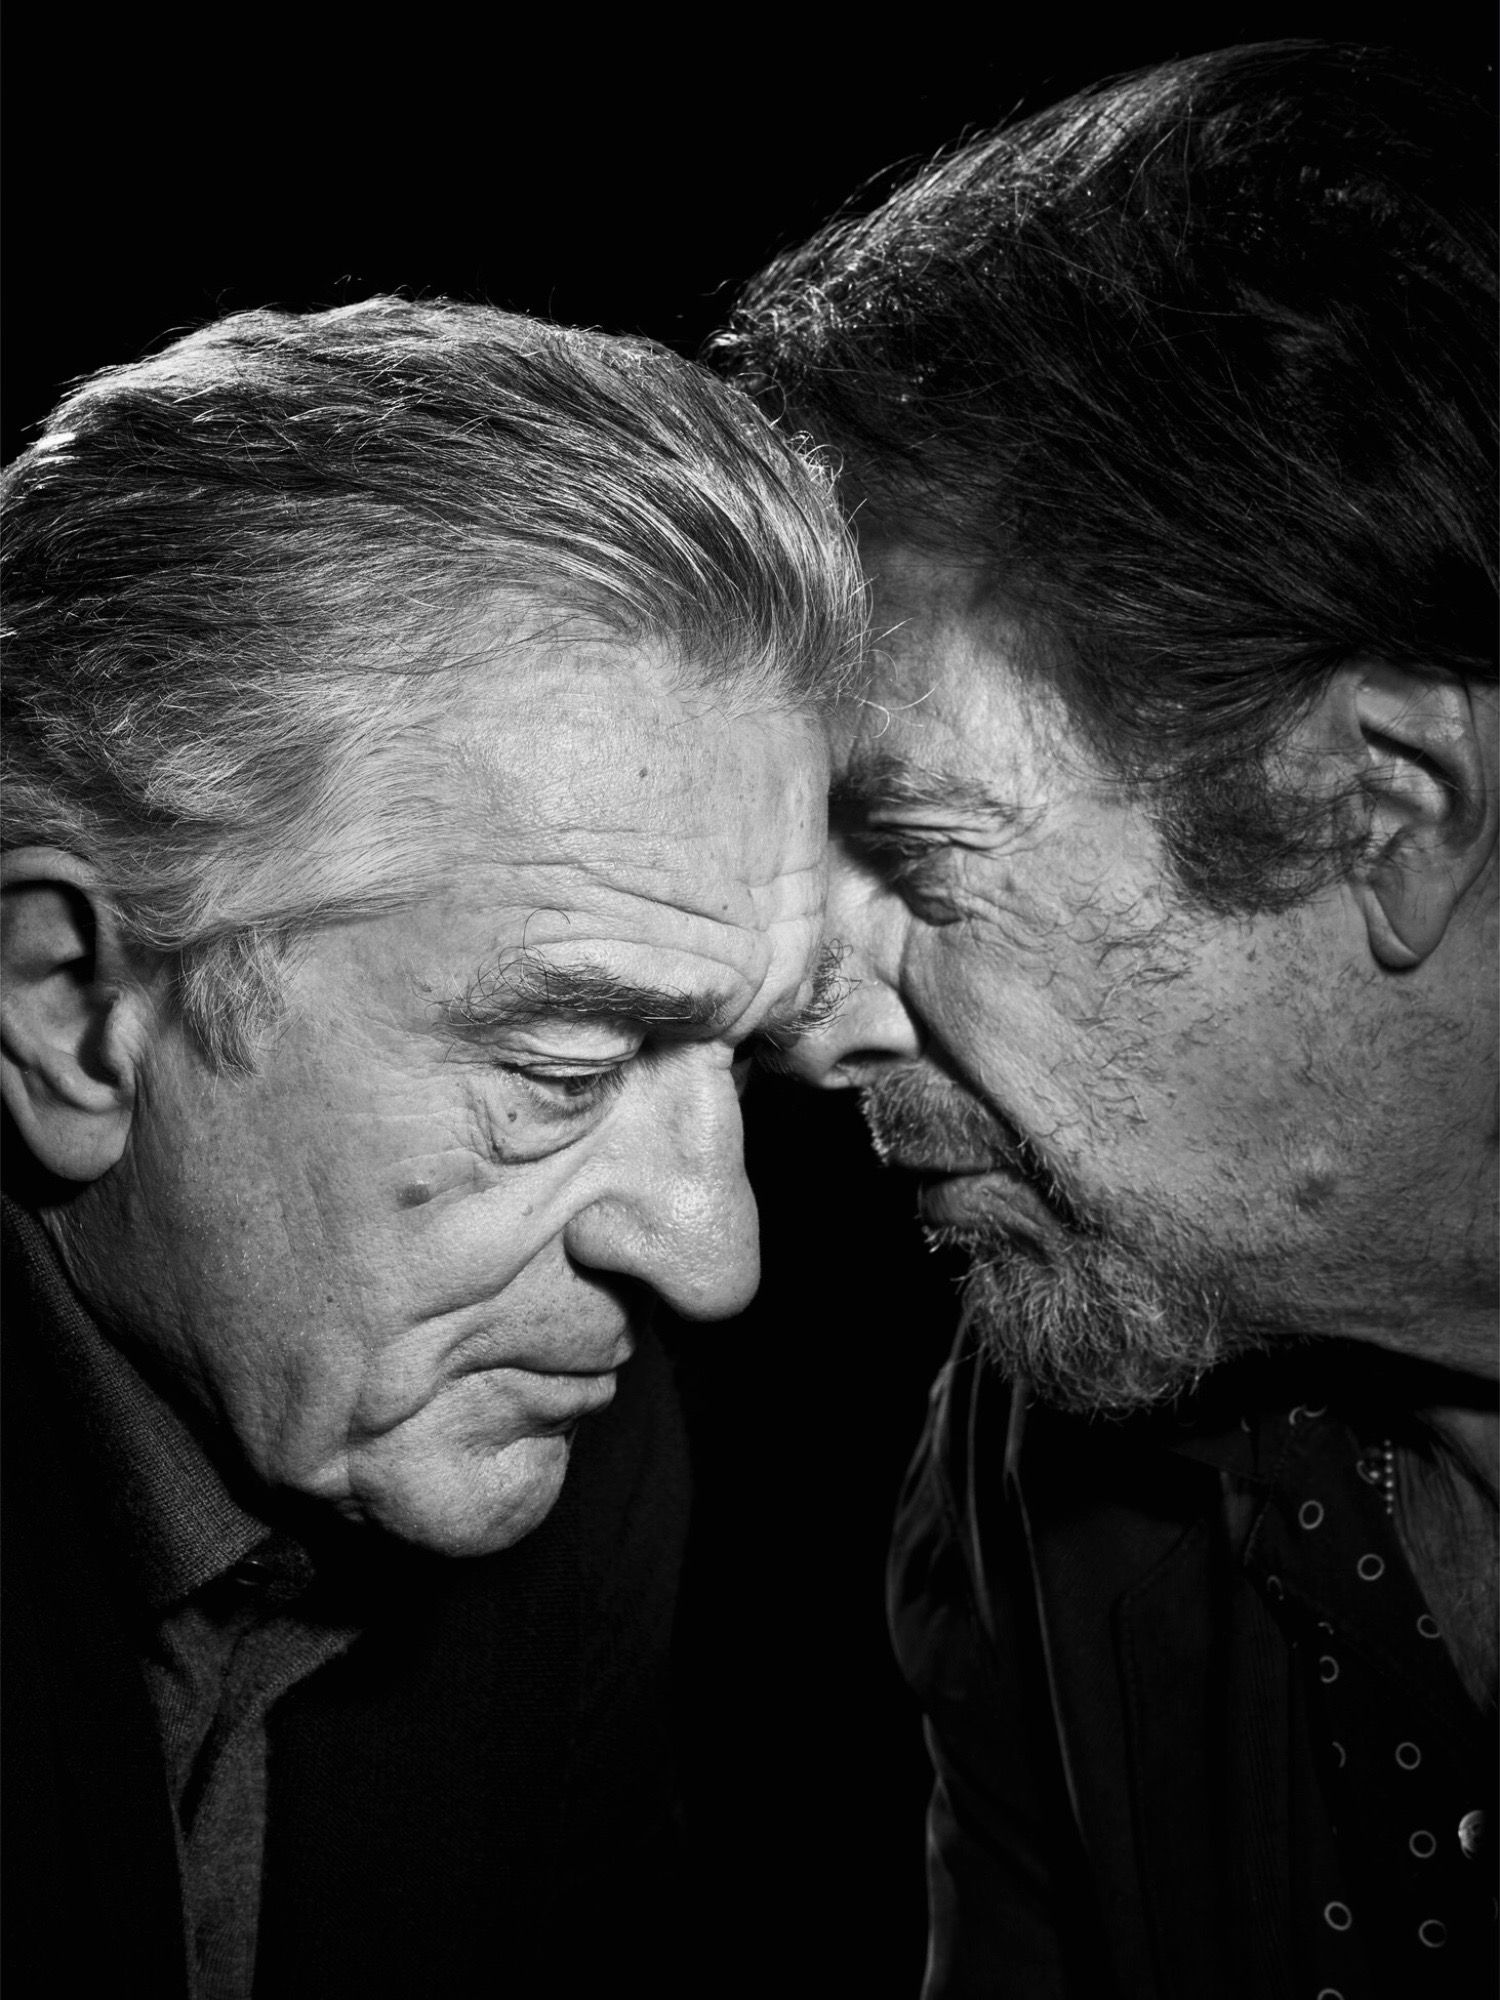 Pin By Rose On Actor Robert De Niro